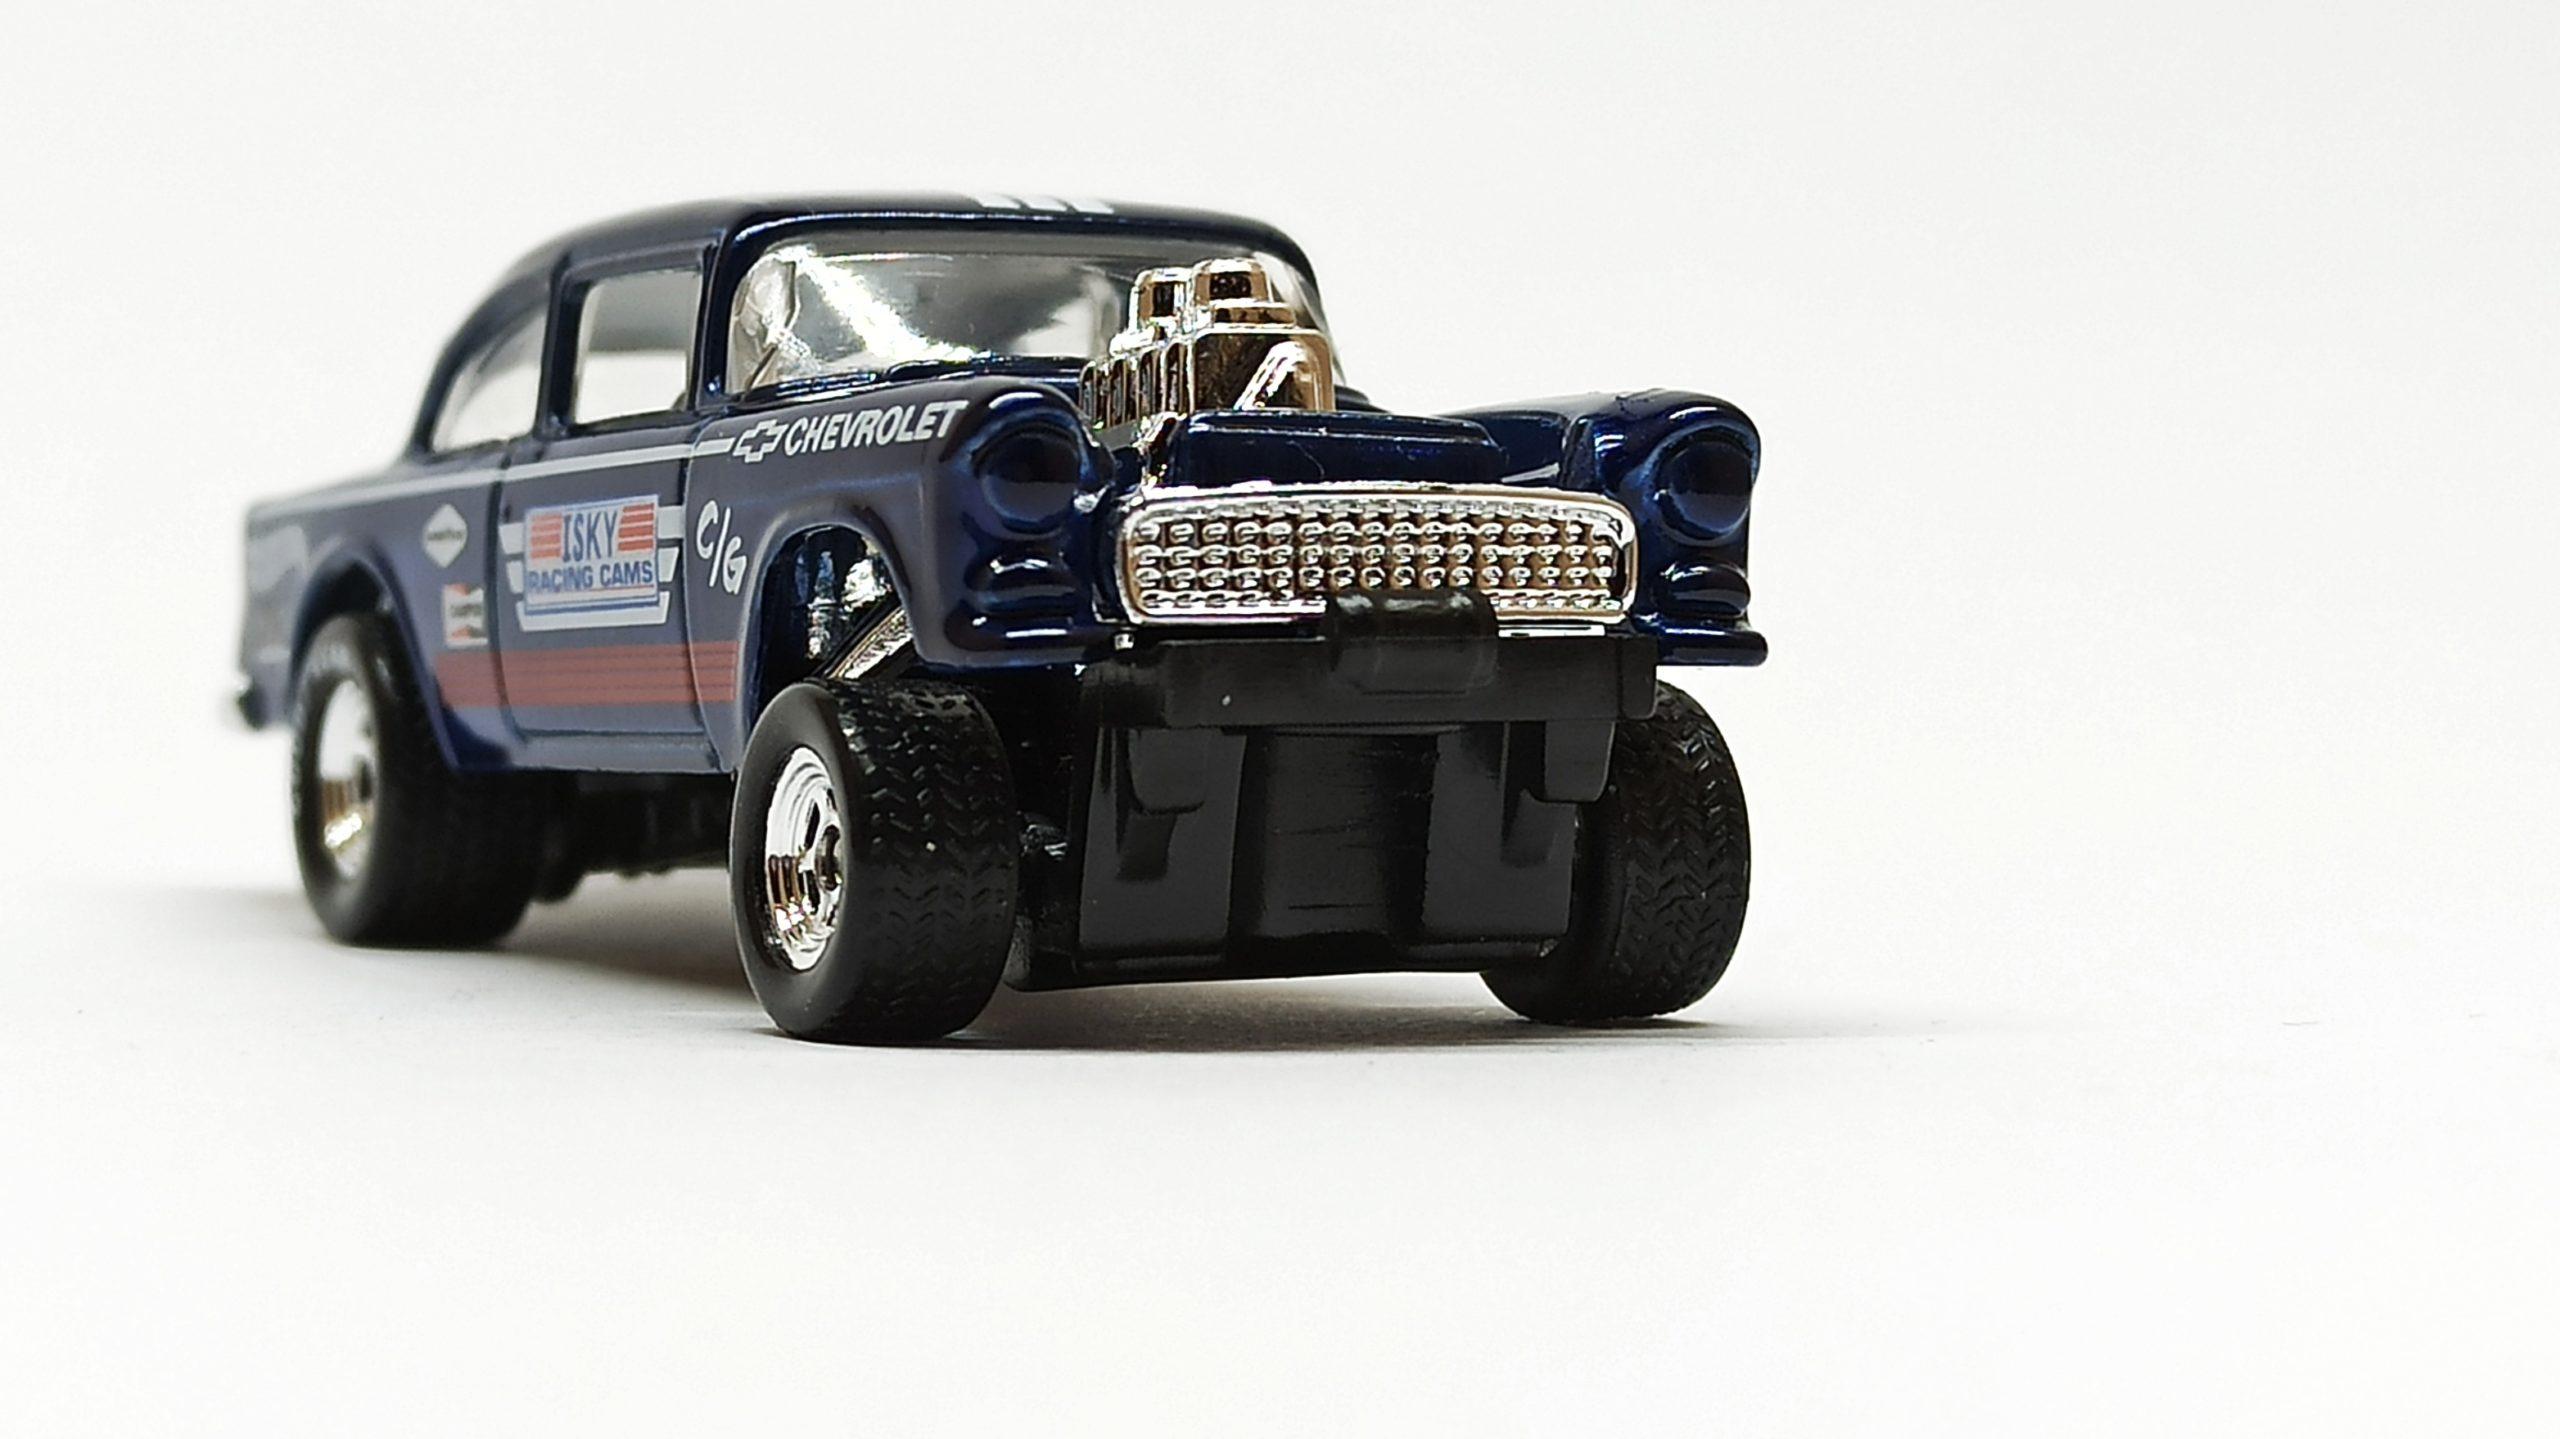 Hot Wheels '55 Chevy Bel Air Gasser (BFF38) 2014 (241/250) HW Workshop: HW Performance spectraflame dark blue Super Treasure Hunt (STH) front angle